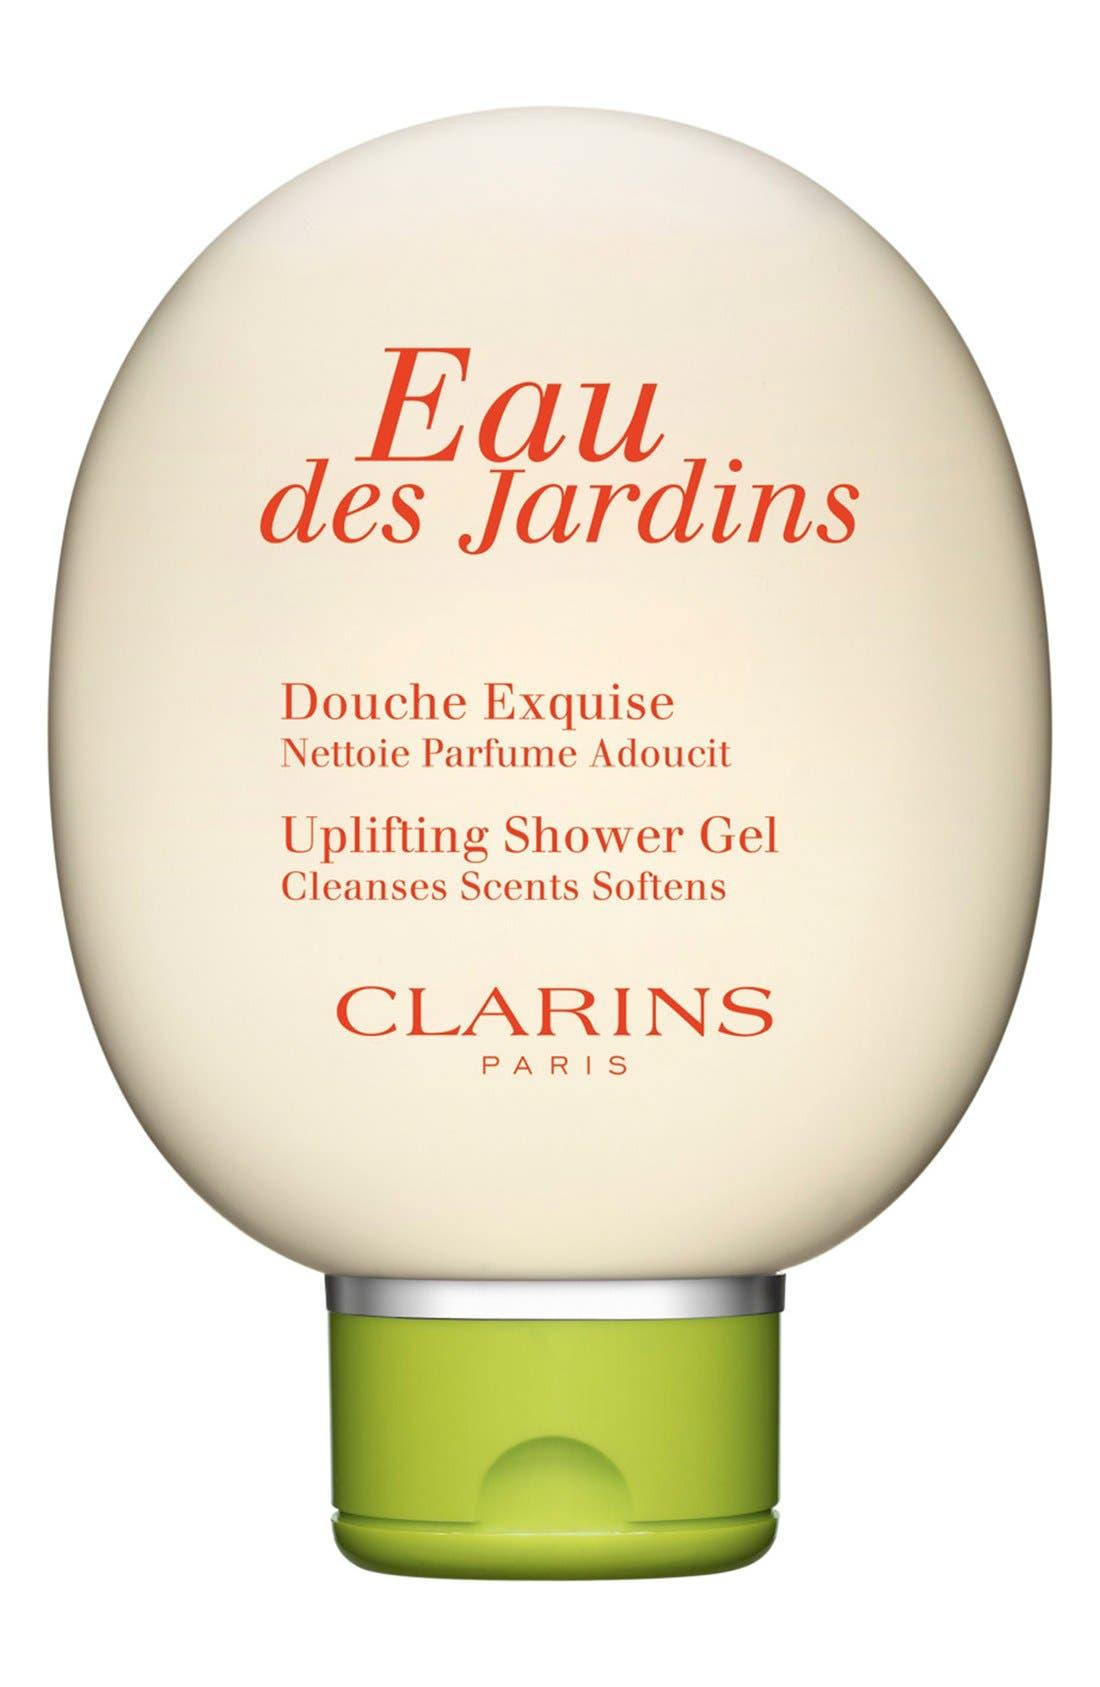 Clarins 'Eau des Jardins' Uplifting Shower Gel